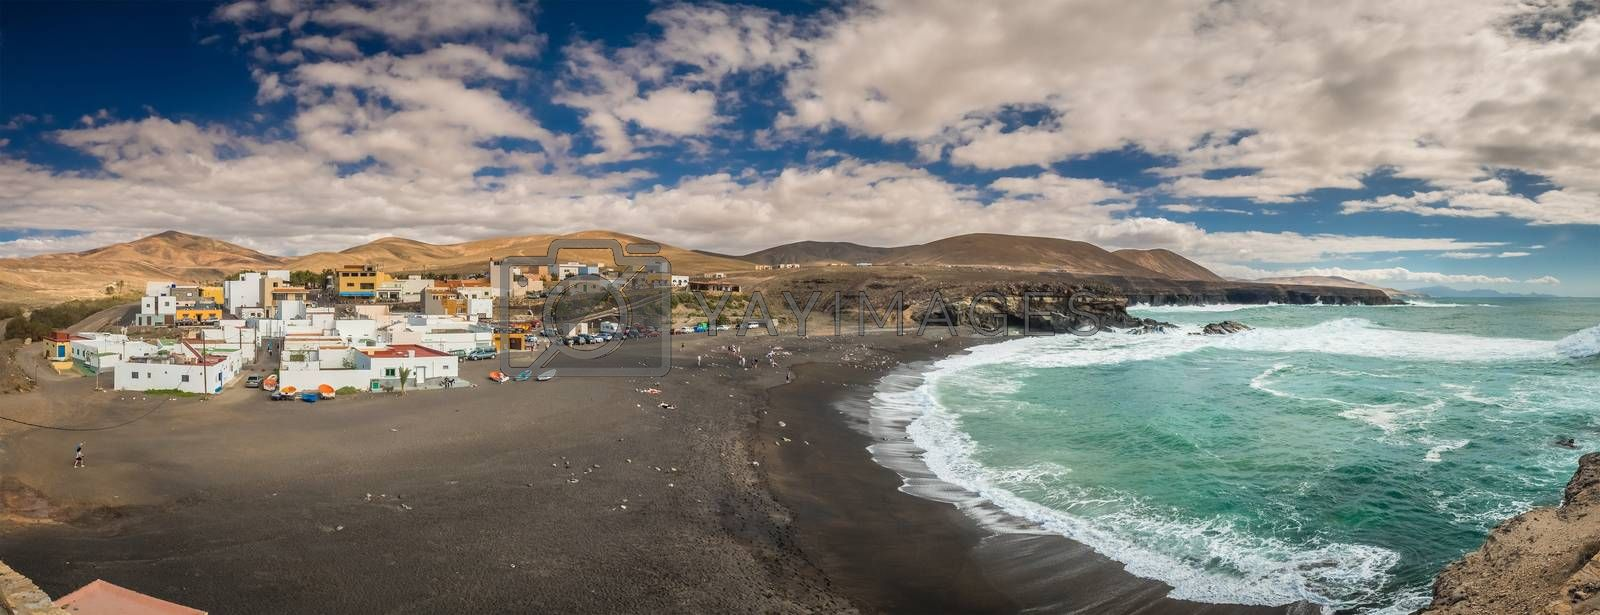 Ajuy - popular fishing village on theFuerteventura west coast, Parque Rural de Betancuria in Fuerteventura, Canary Island, Spain. Picture taken 13 April 2016.